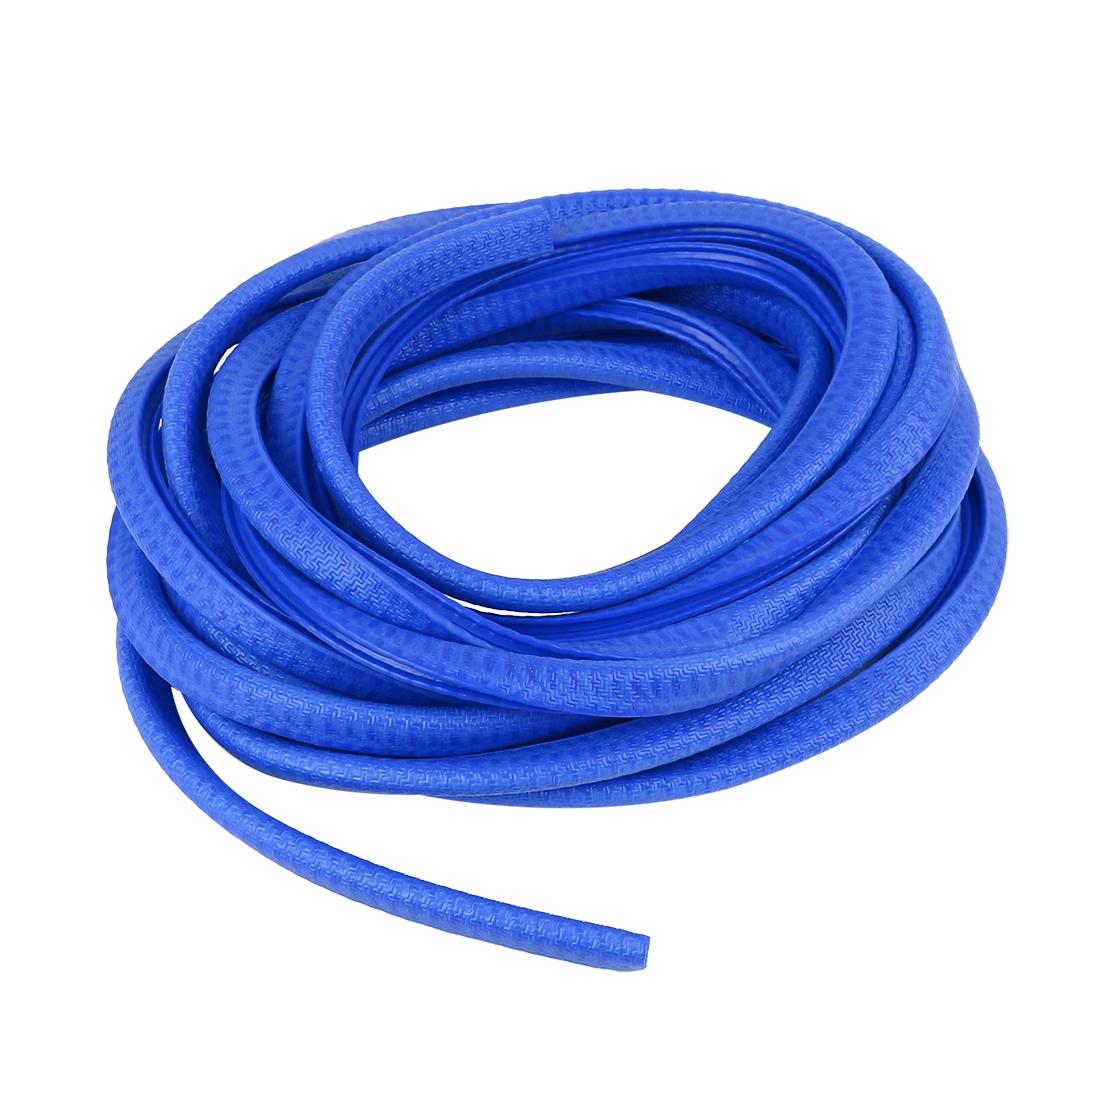 5m Rubber U Shape Car Door Edge Trim Guard Protector Seal Strip Roll Blue